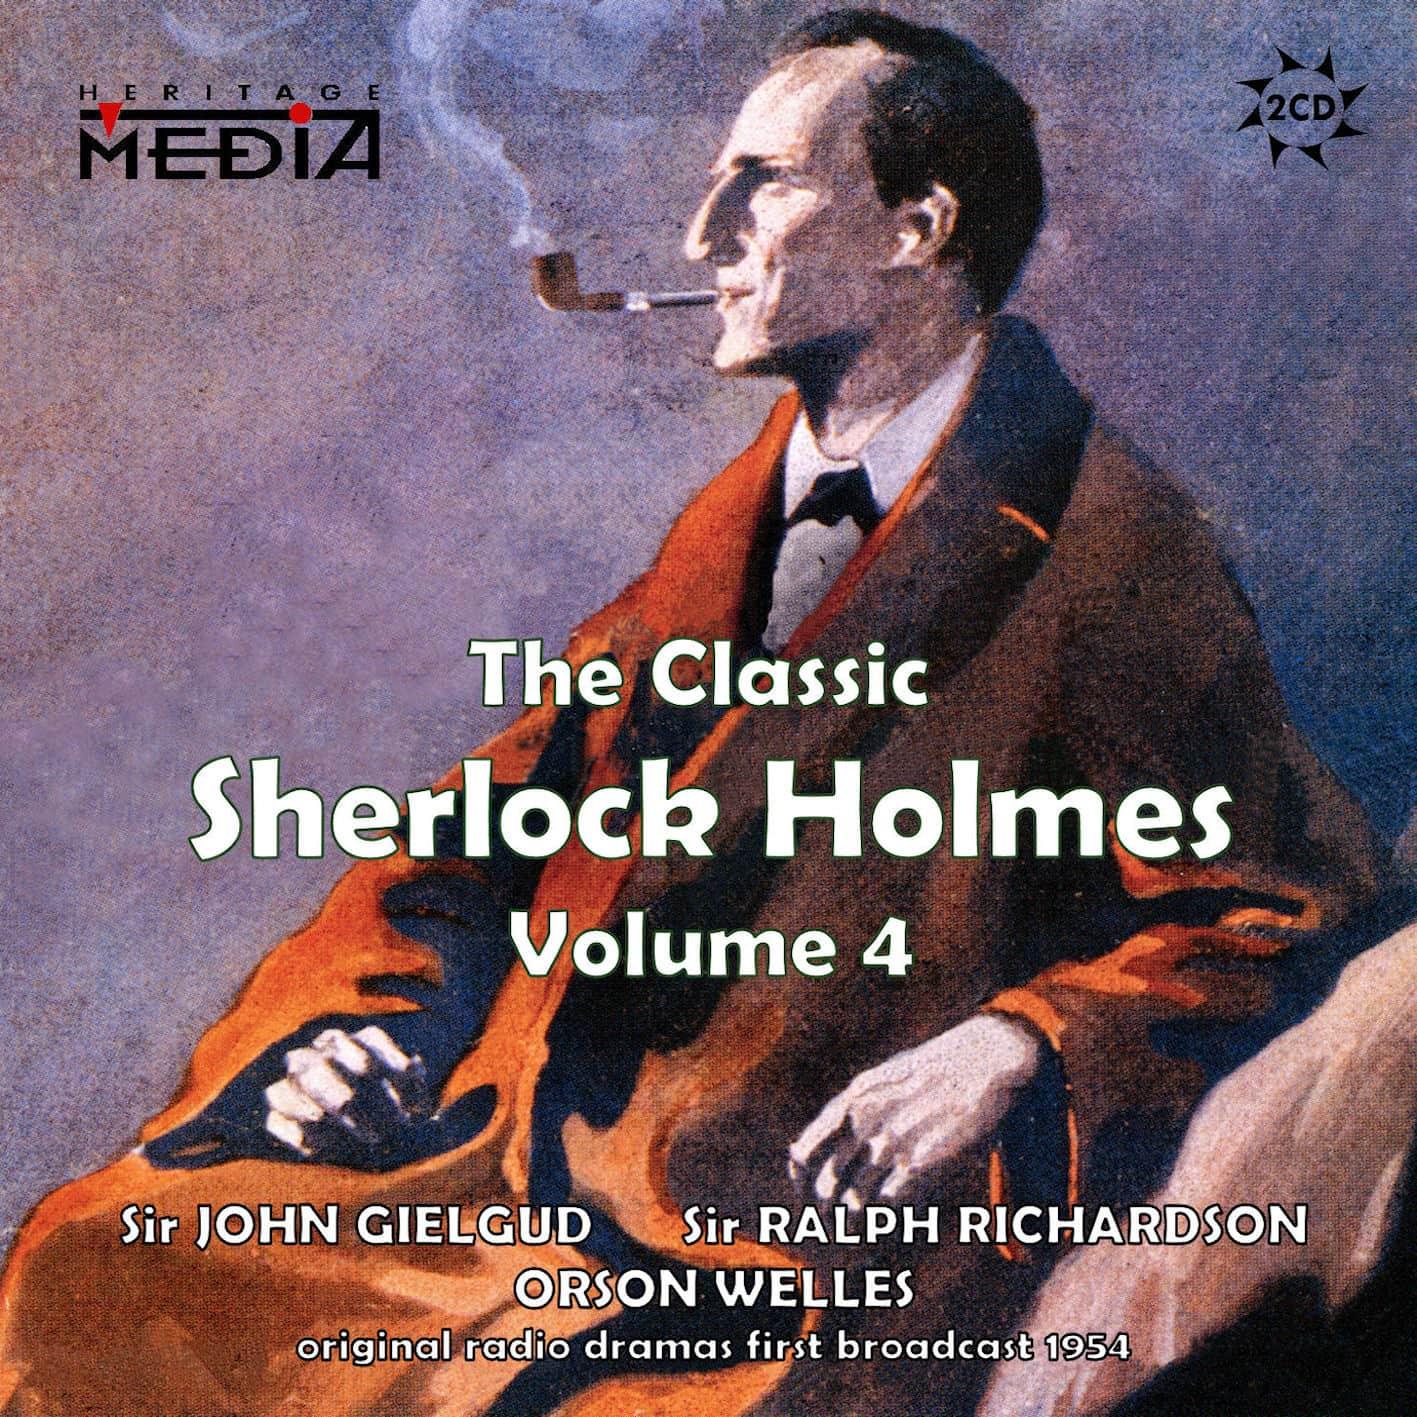 The Classic Sherlock Holmes, vol. 4 (2CD)